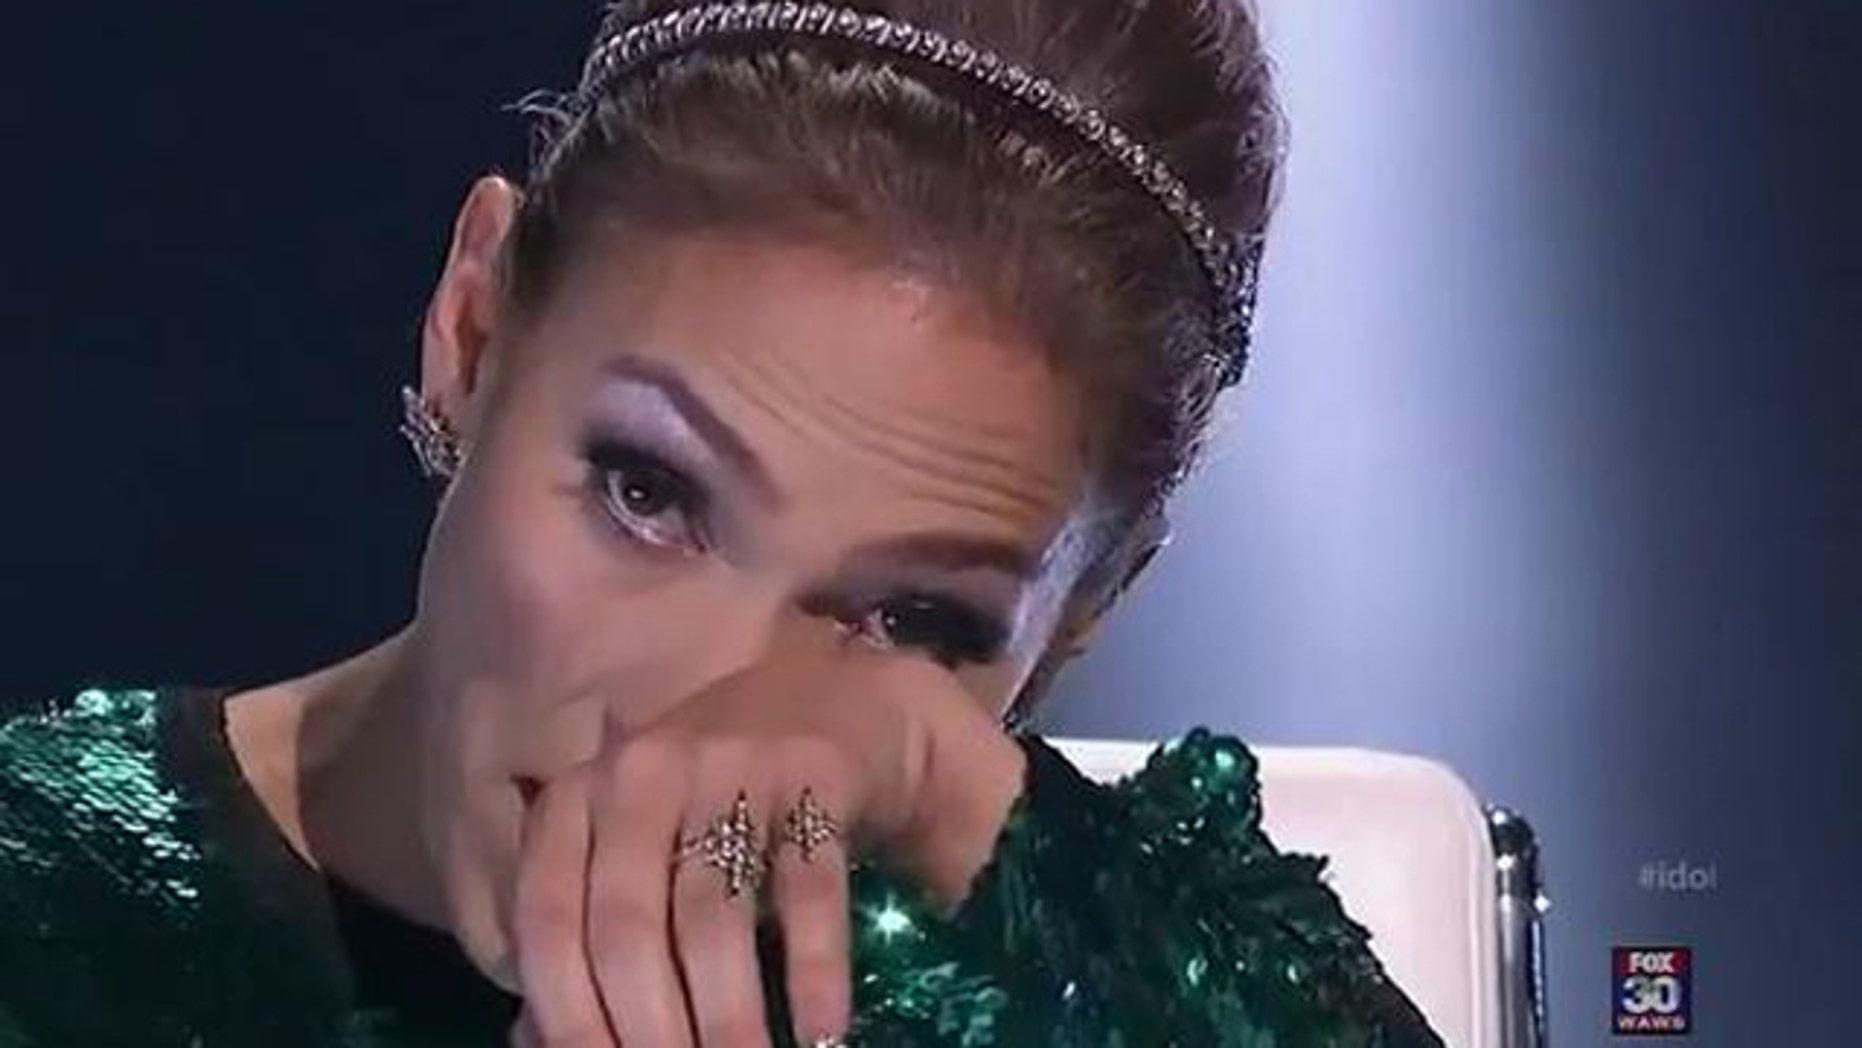 Feb. 23, 2012: Jennifer Lopez wipes tears as she tells American Idol contestant Jermaine Jones he did not make it to the top 24.